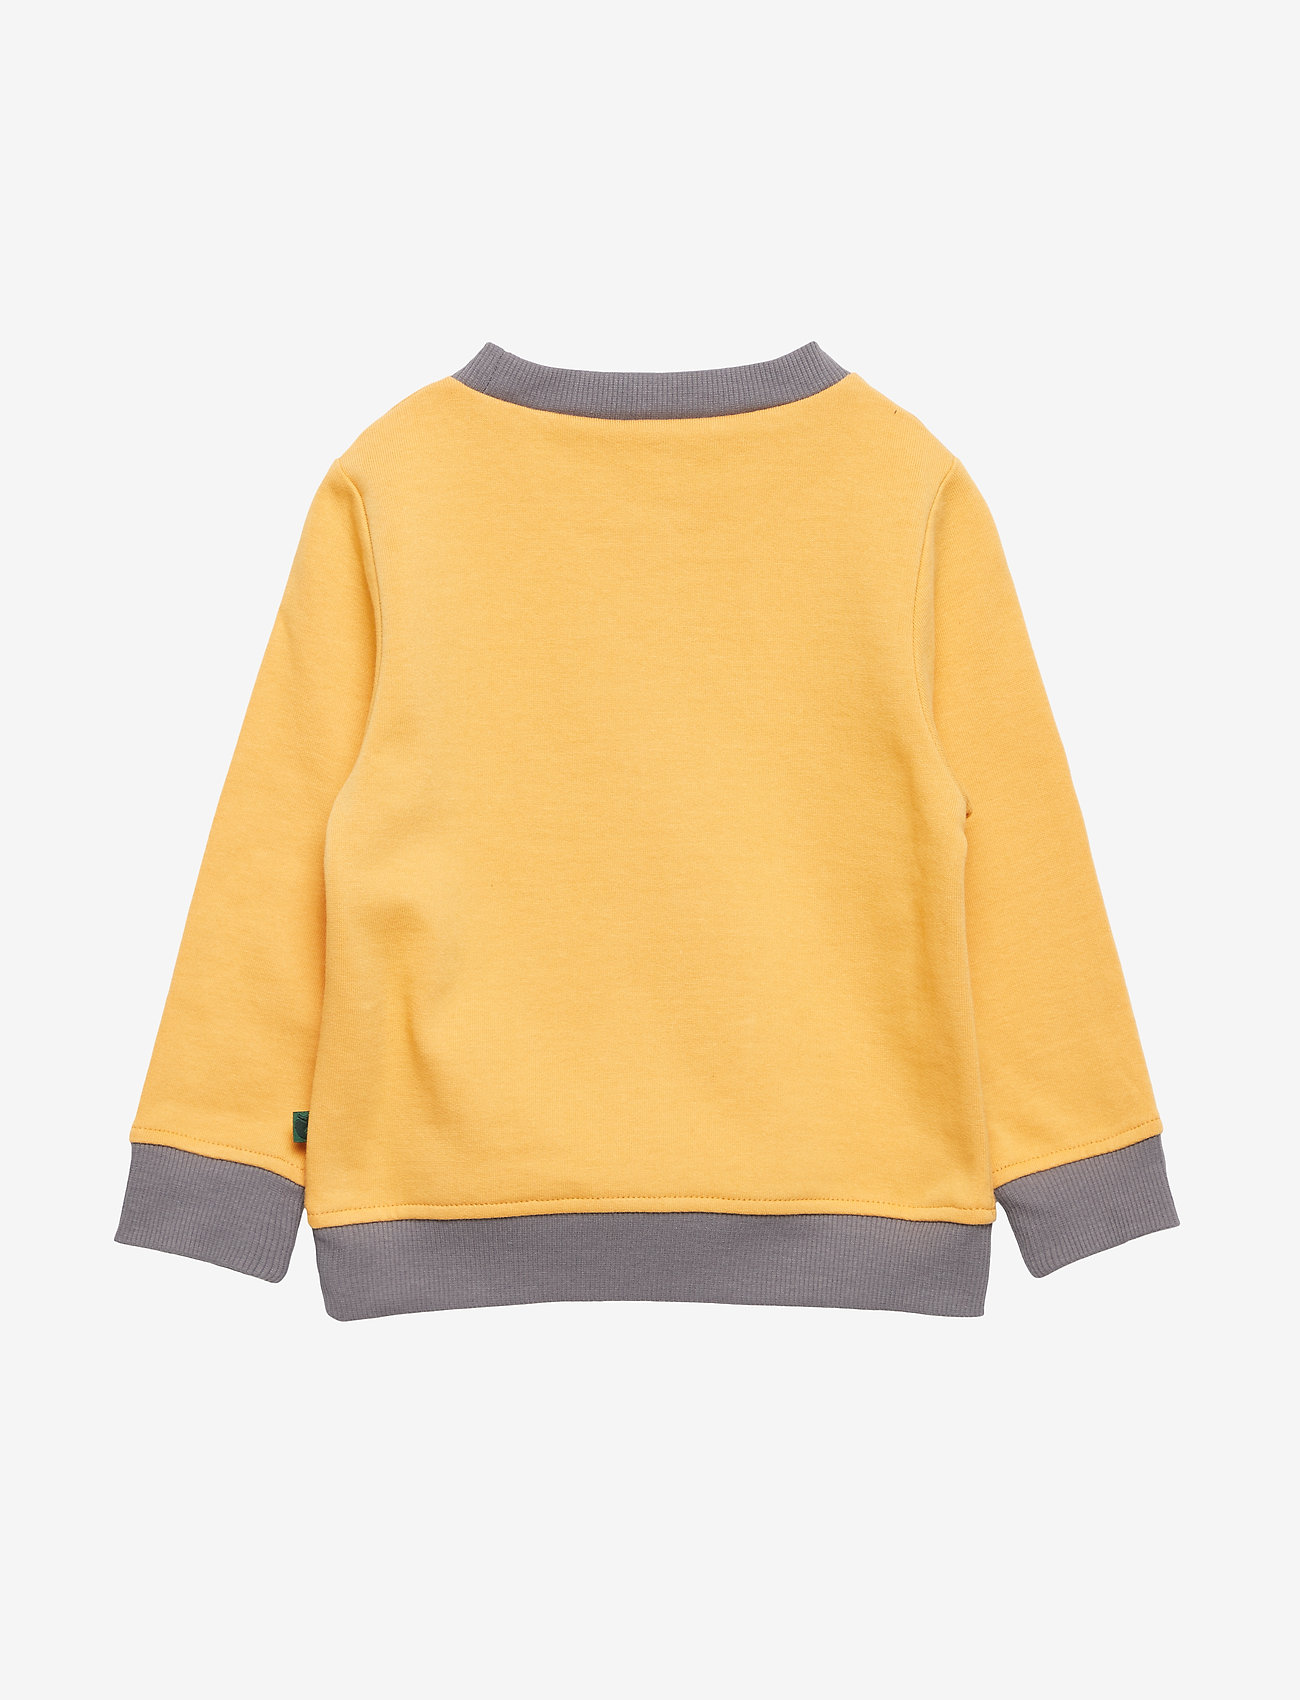 Småfolk - Sweatshirt. Raccon - sweatshirts - ochre - 1